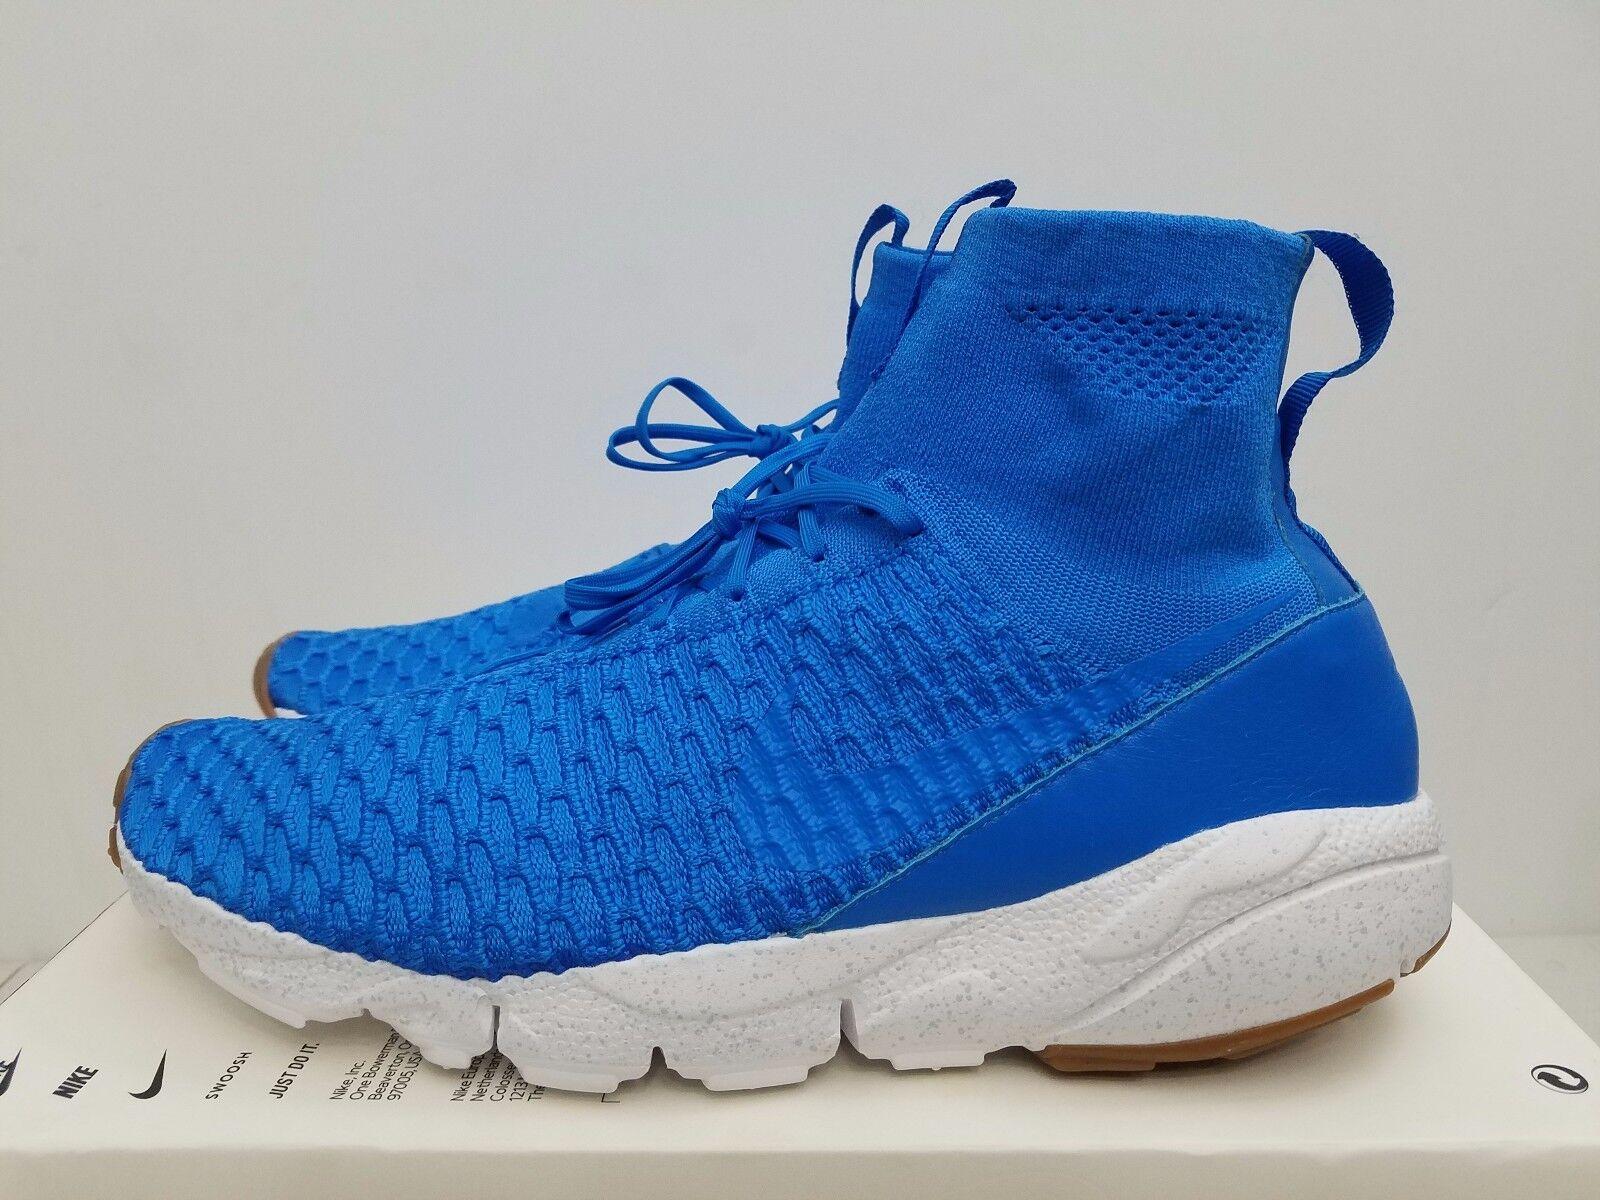 Nike Air Footscape Magista SP Photo Blue/Summit White 652960-441